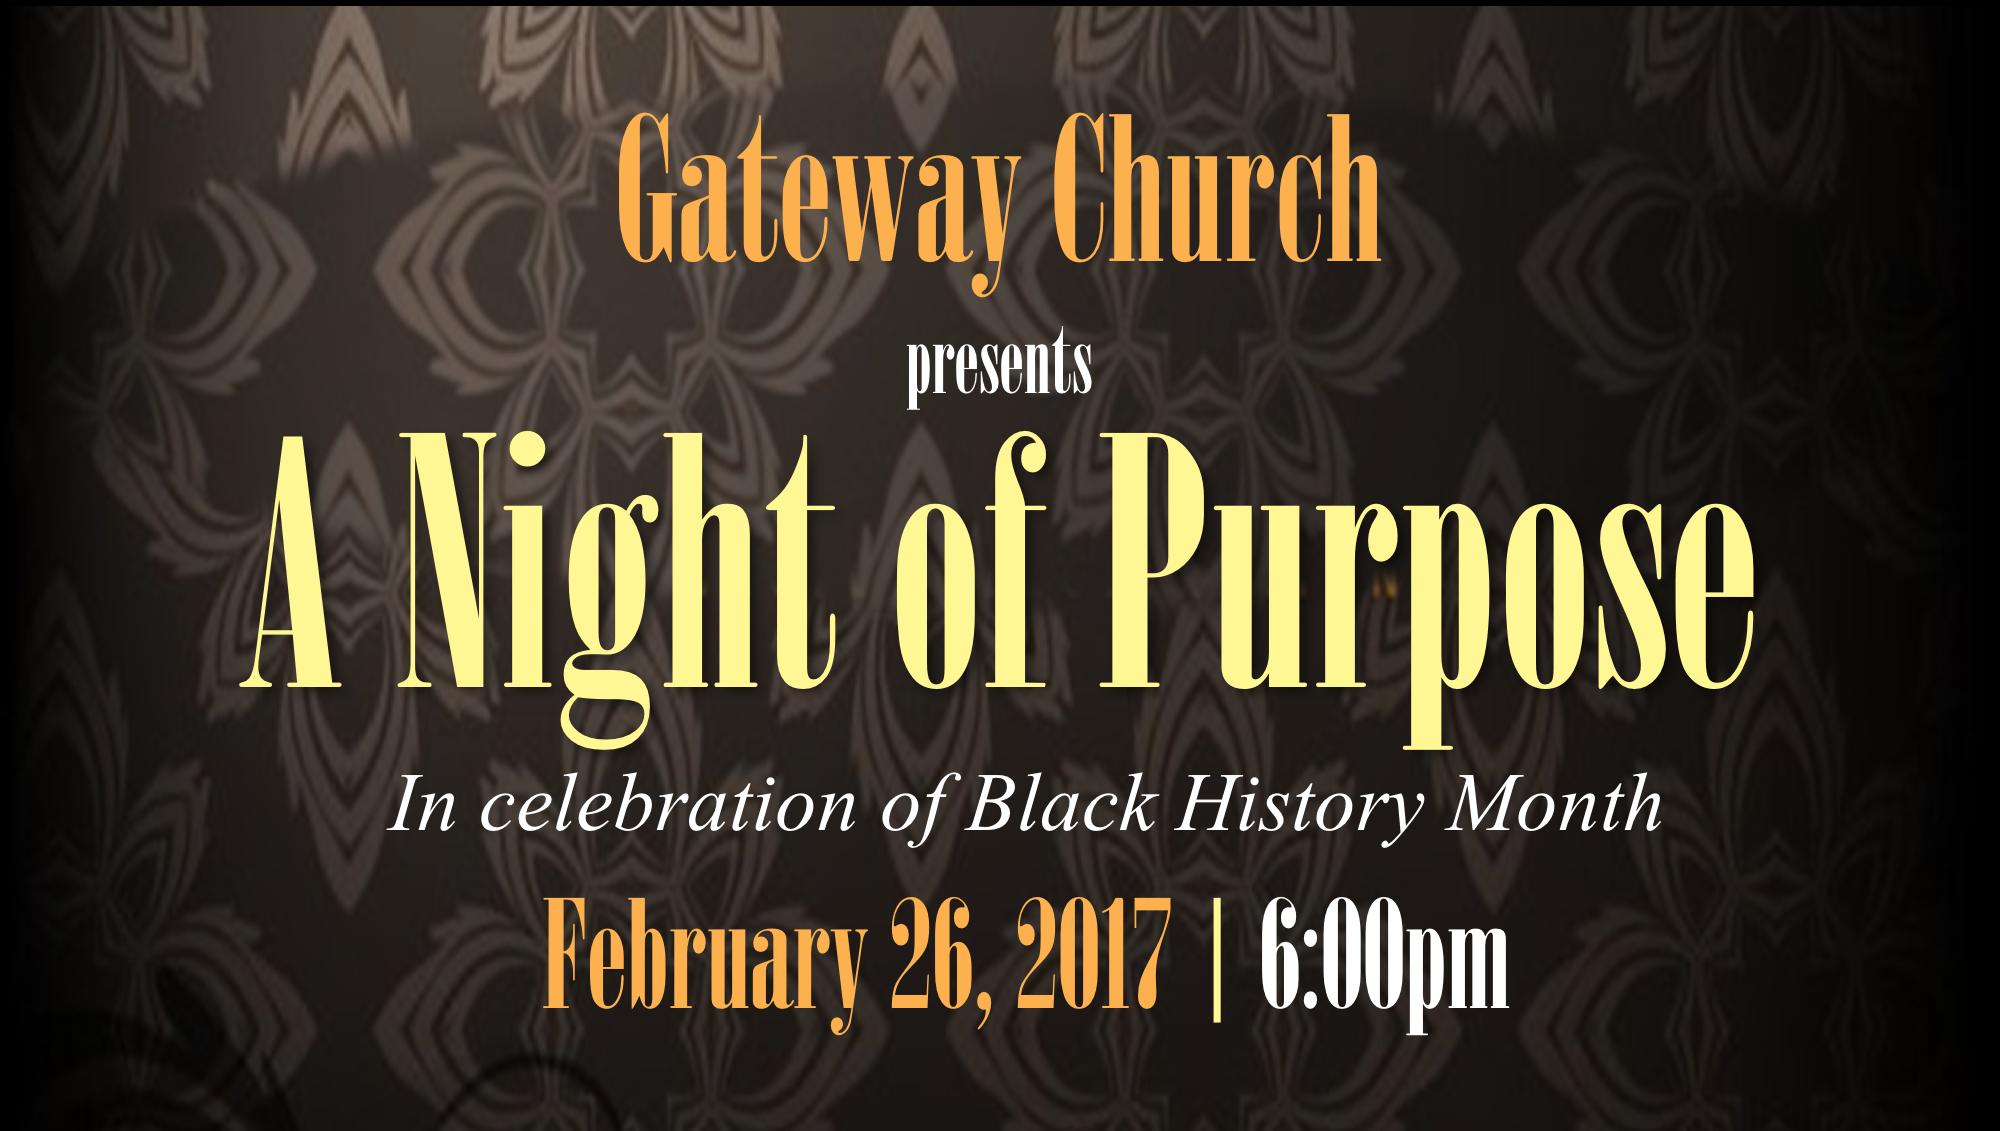 Black History Night of Purpose